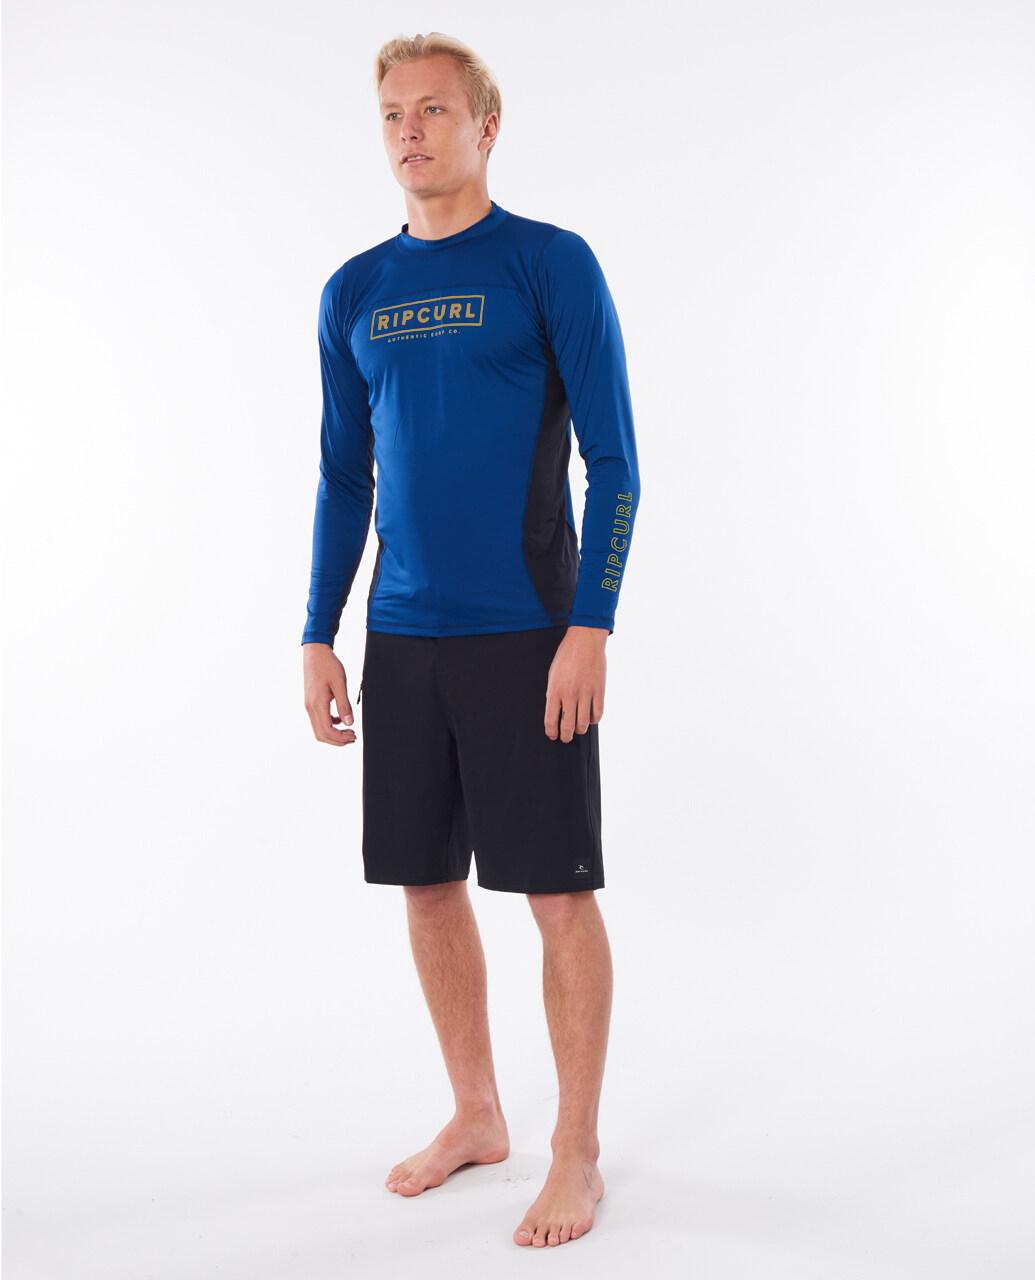 RipCurl เสื้อว่ายน้ำ กันUV WLYYOM DRIVE RELAXED LS UVT P20